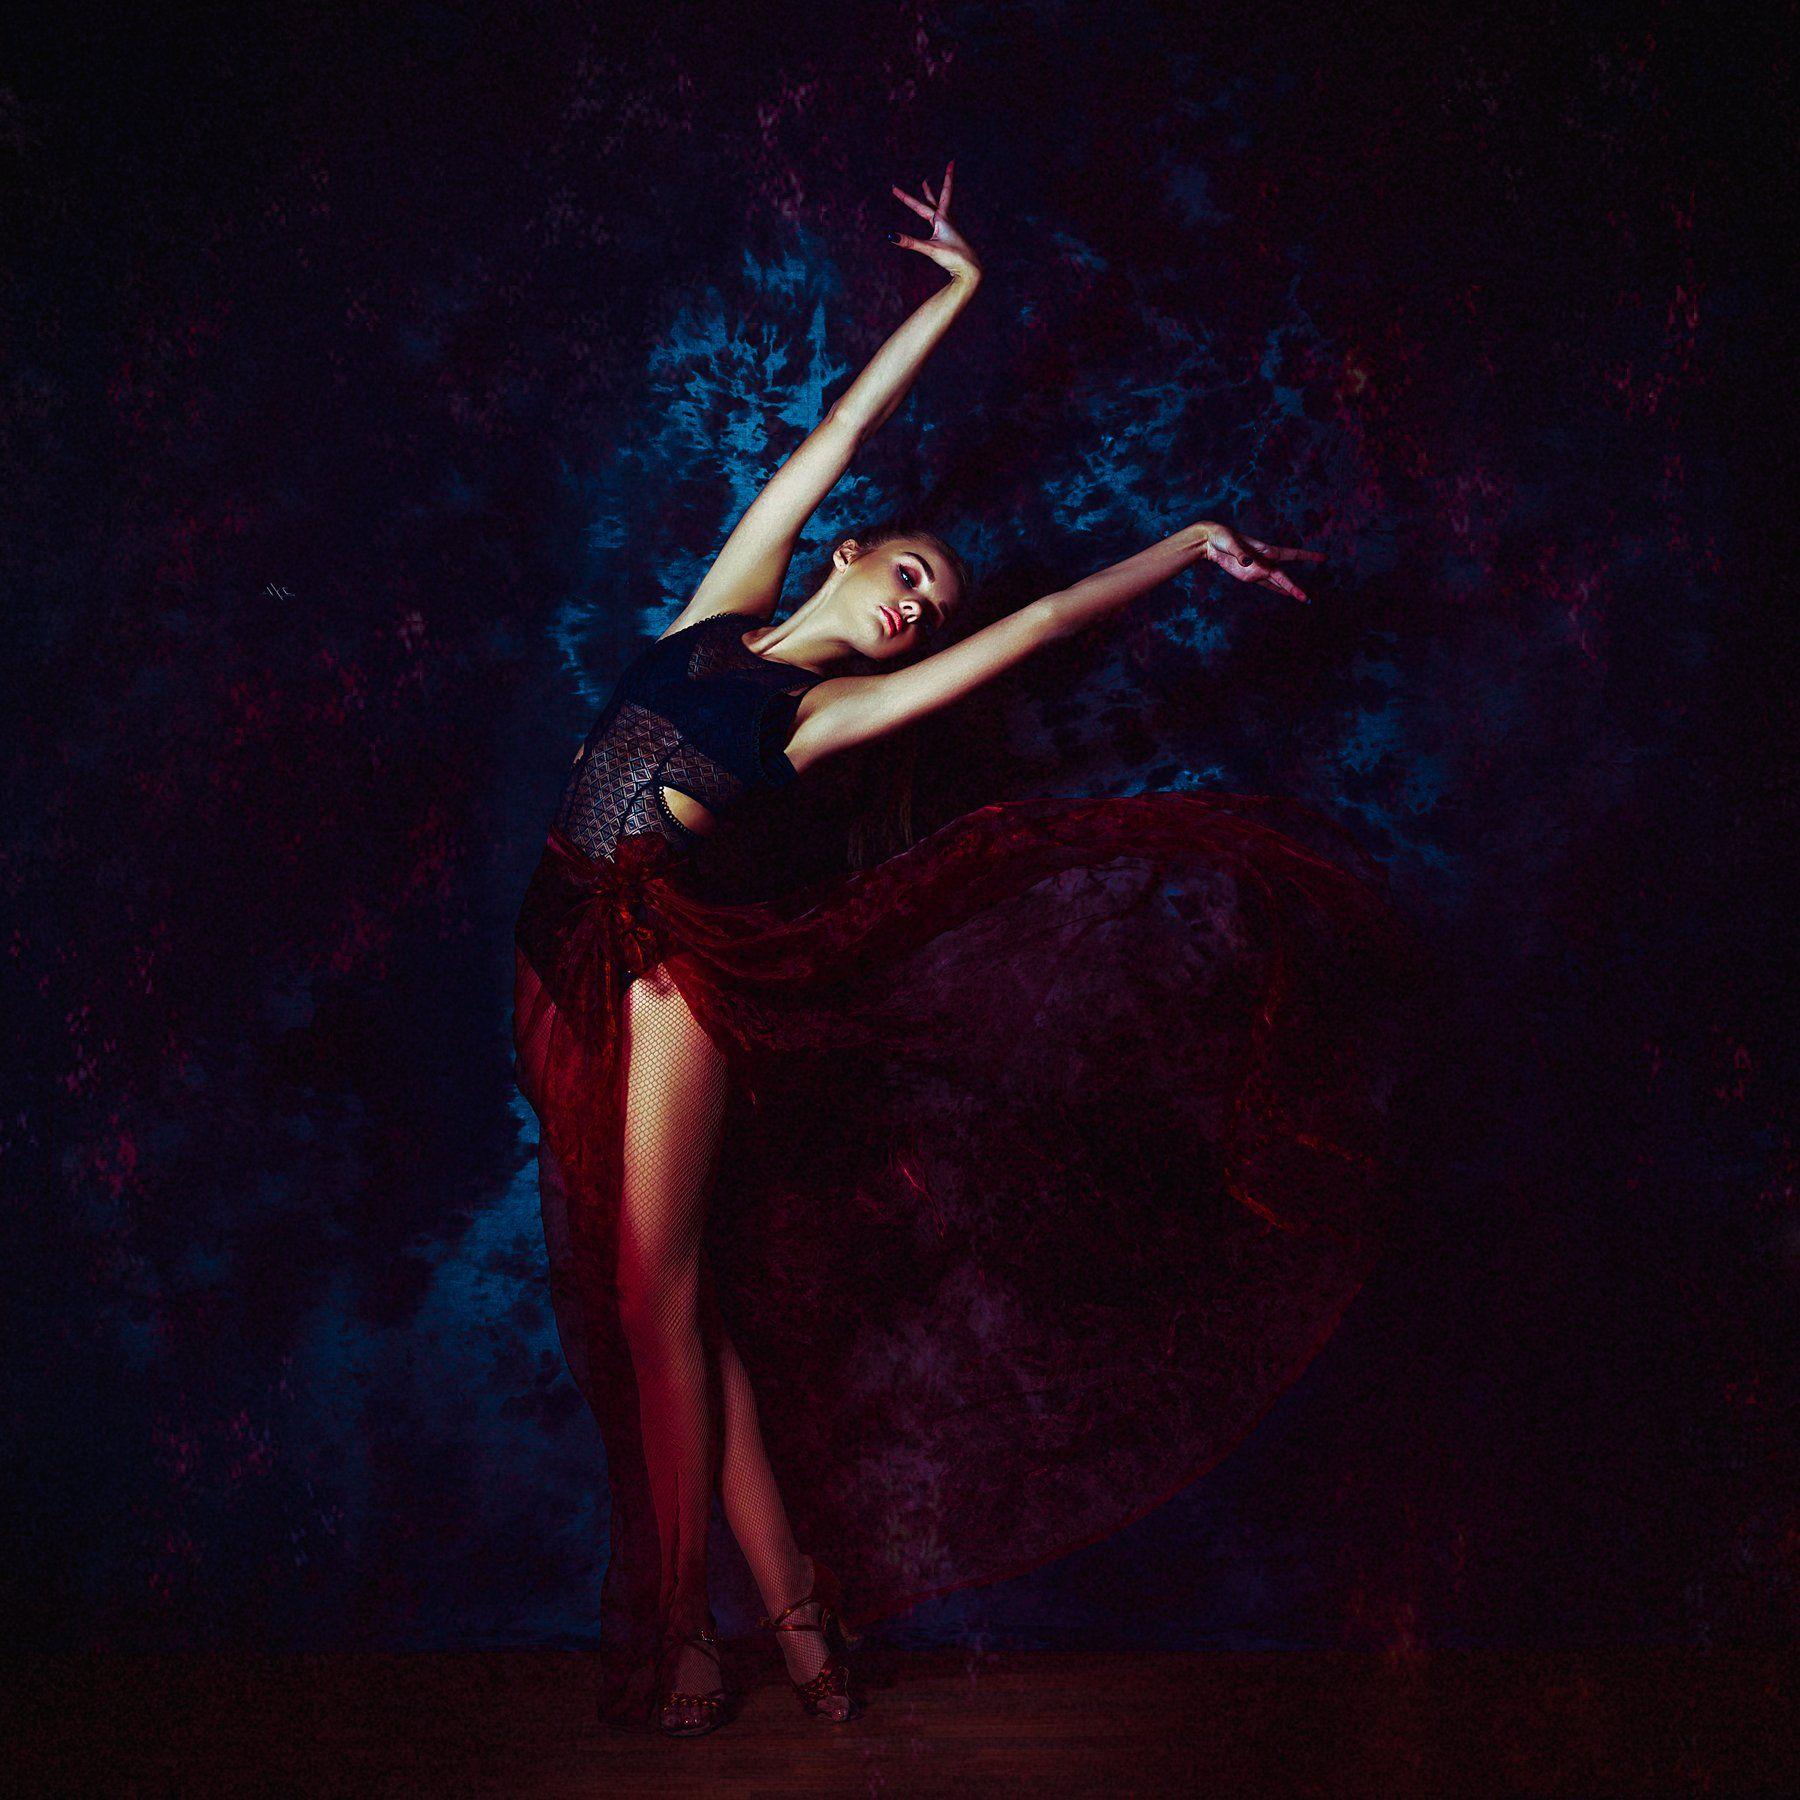 woman, dance, light, Руслан Болгов (Axe)